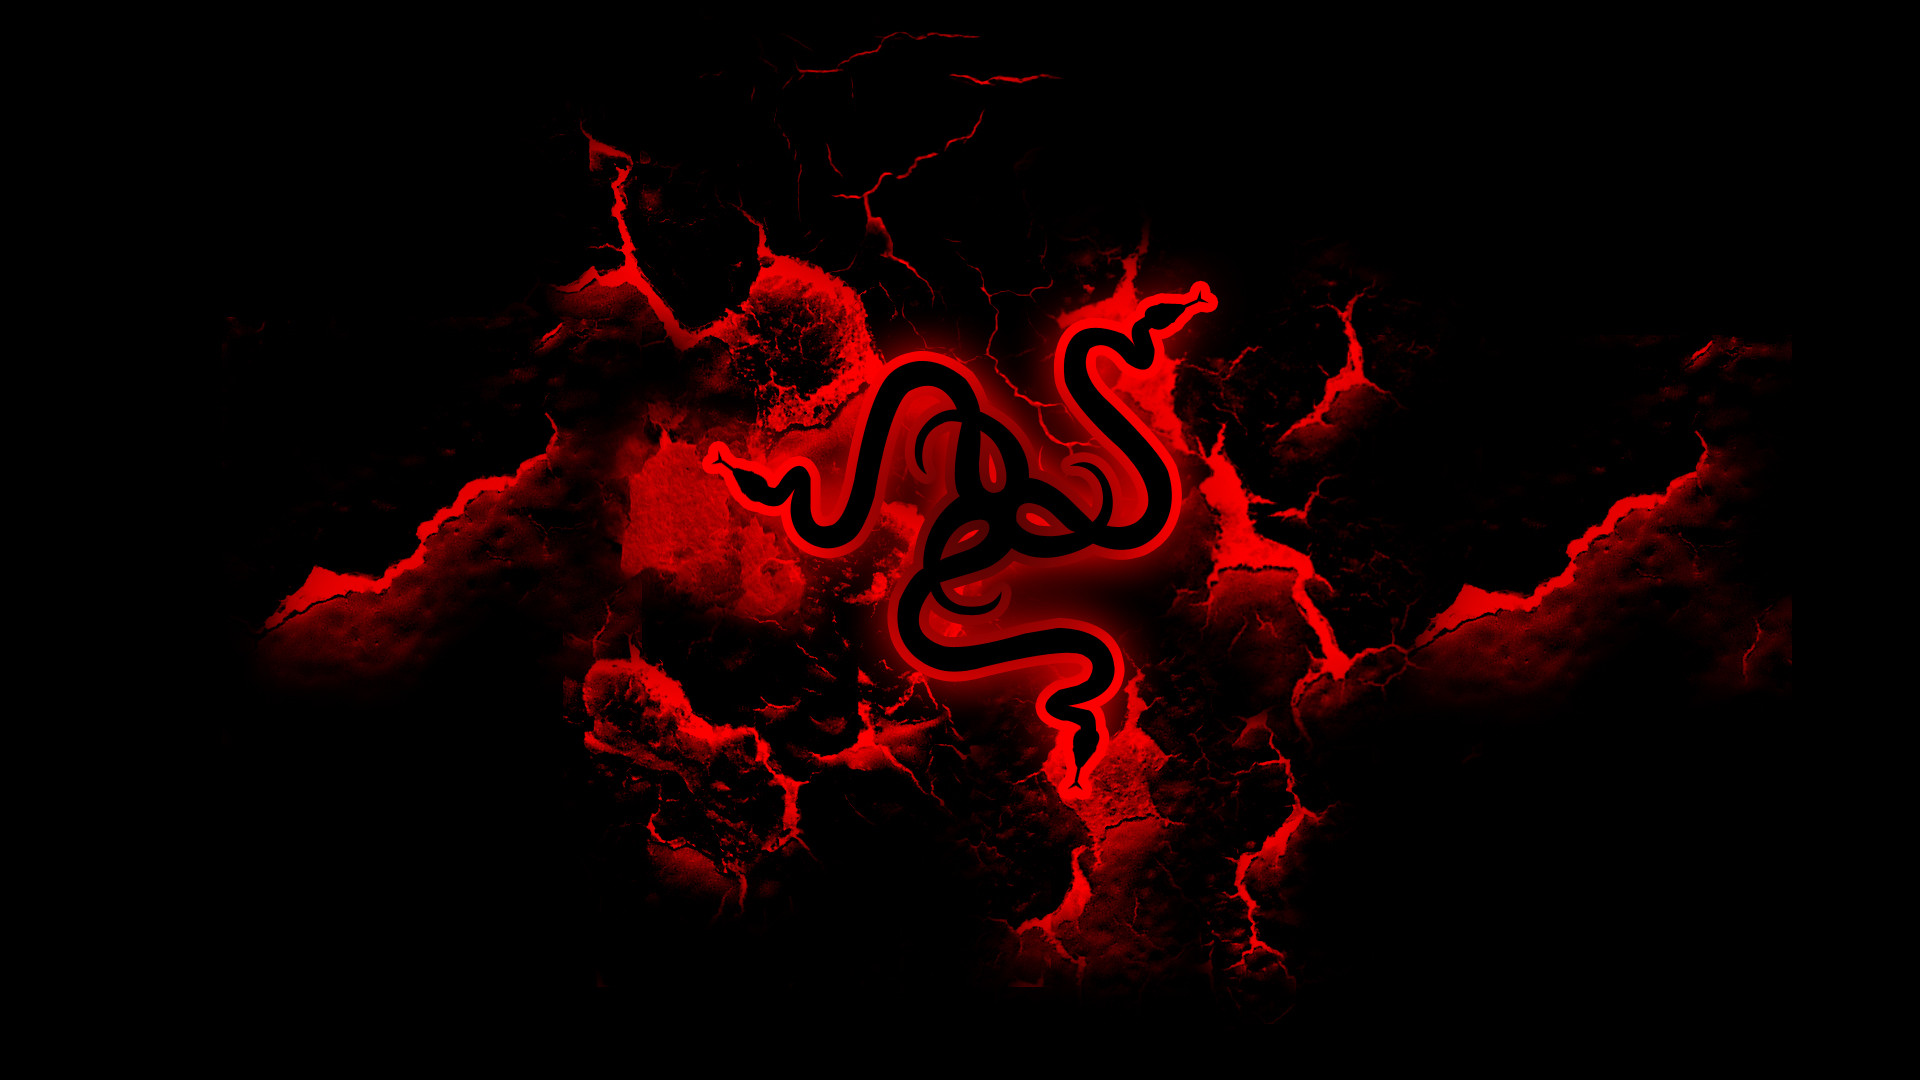 1080p Wallpaper Razer Red Logo | Bathroom Decor